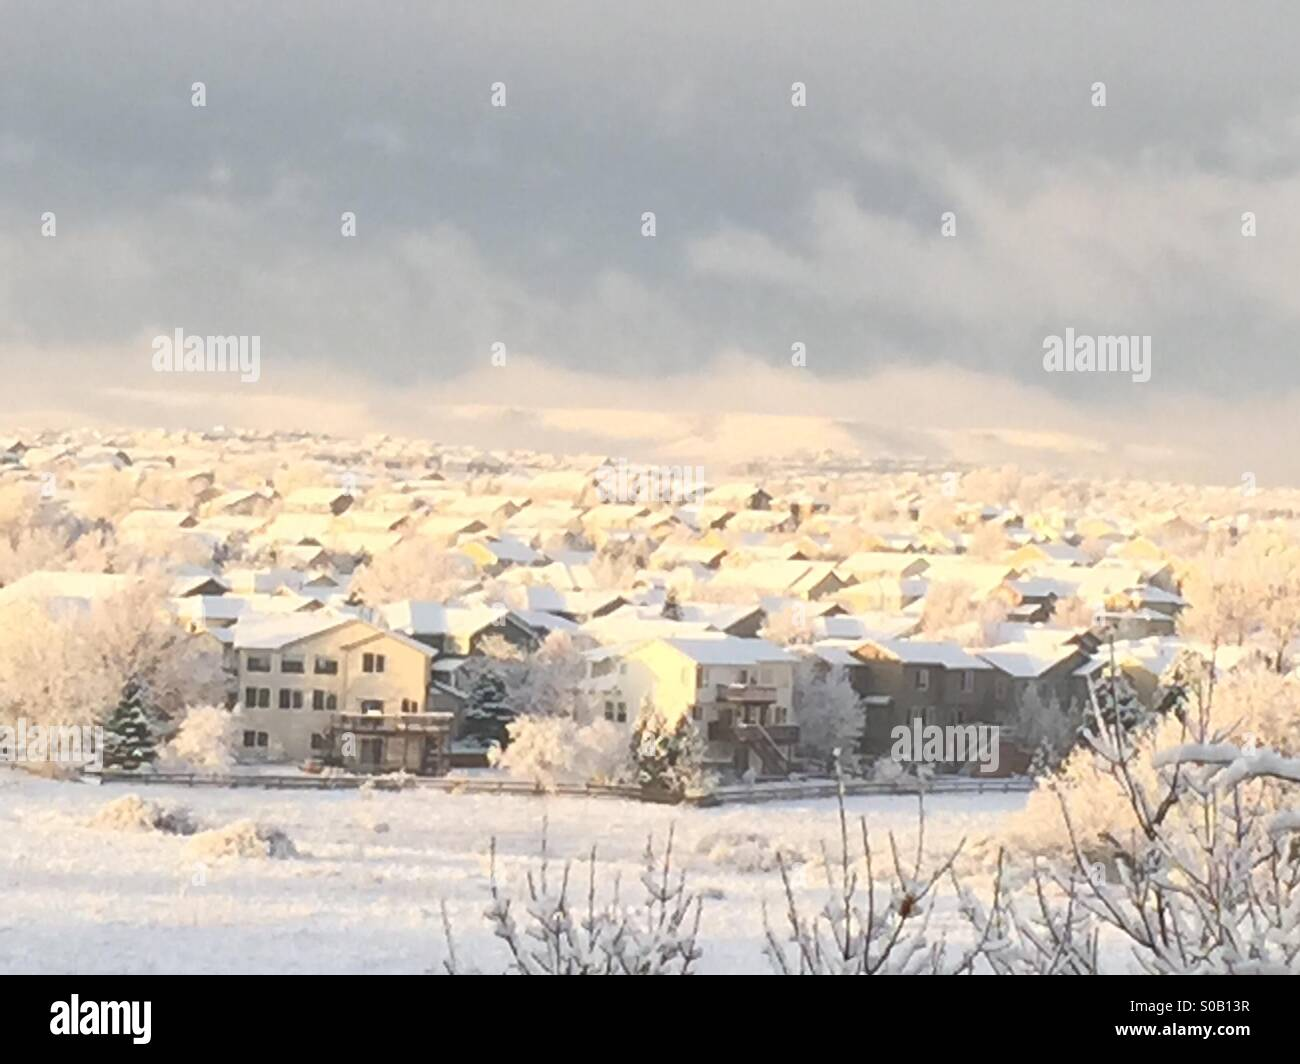 ShowWhite village - Stock Image